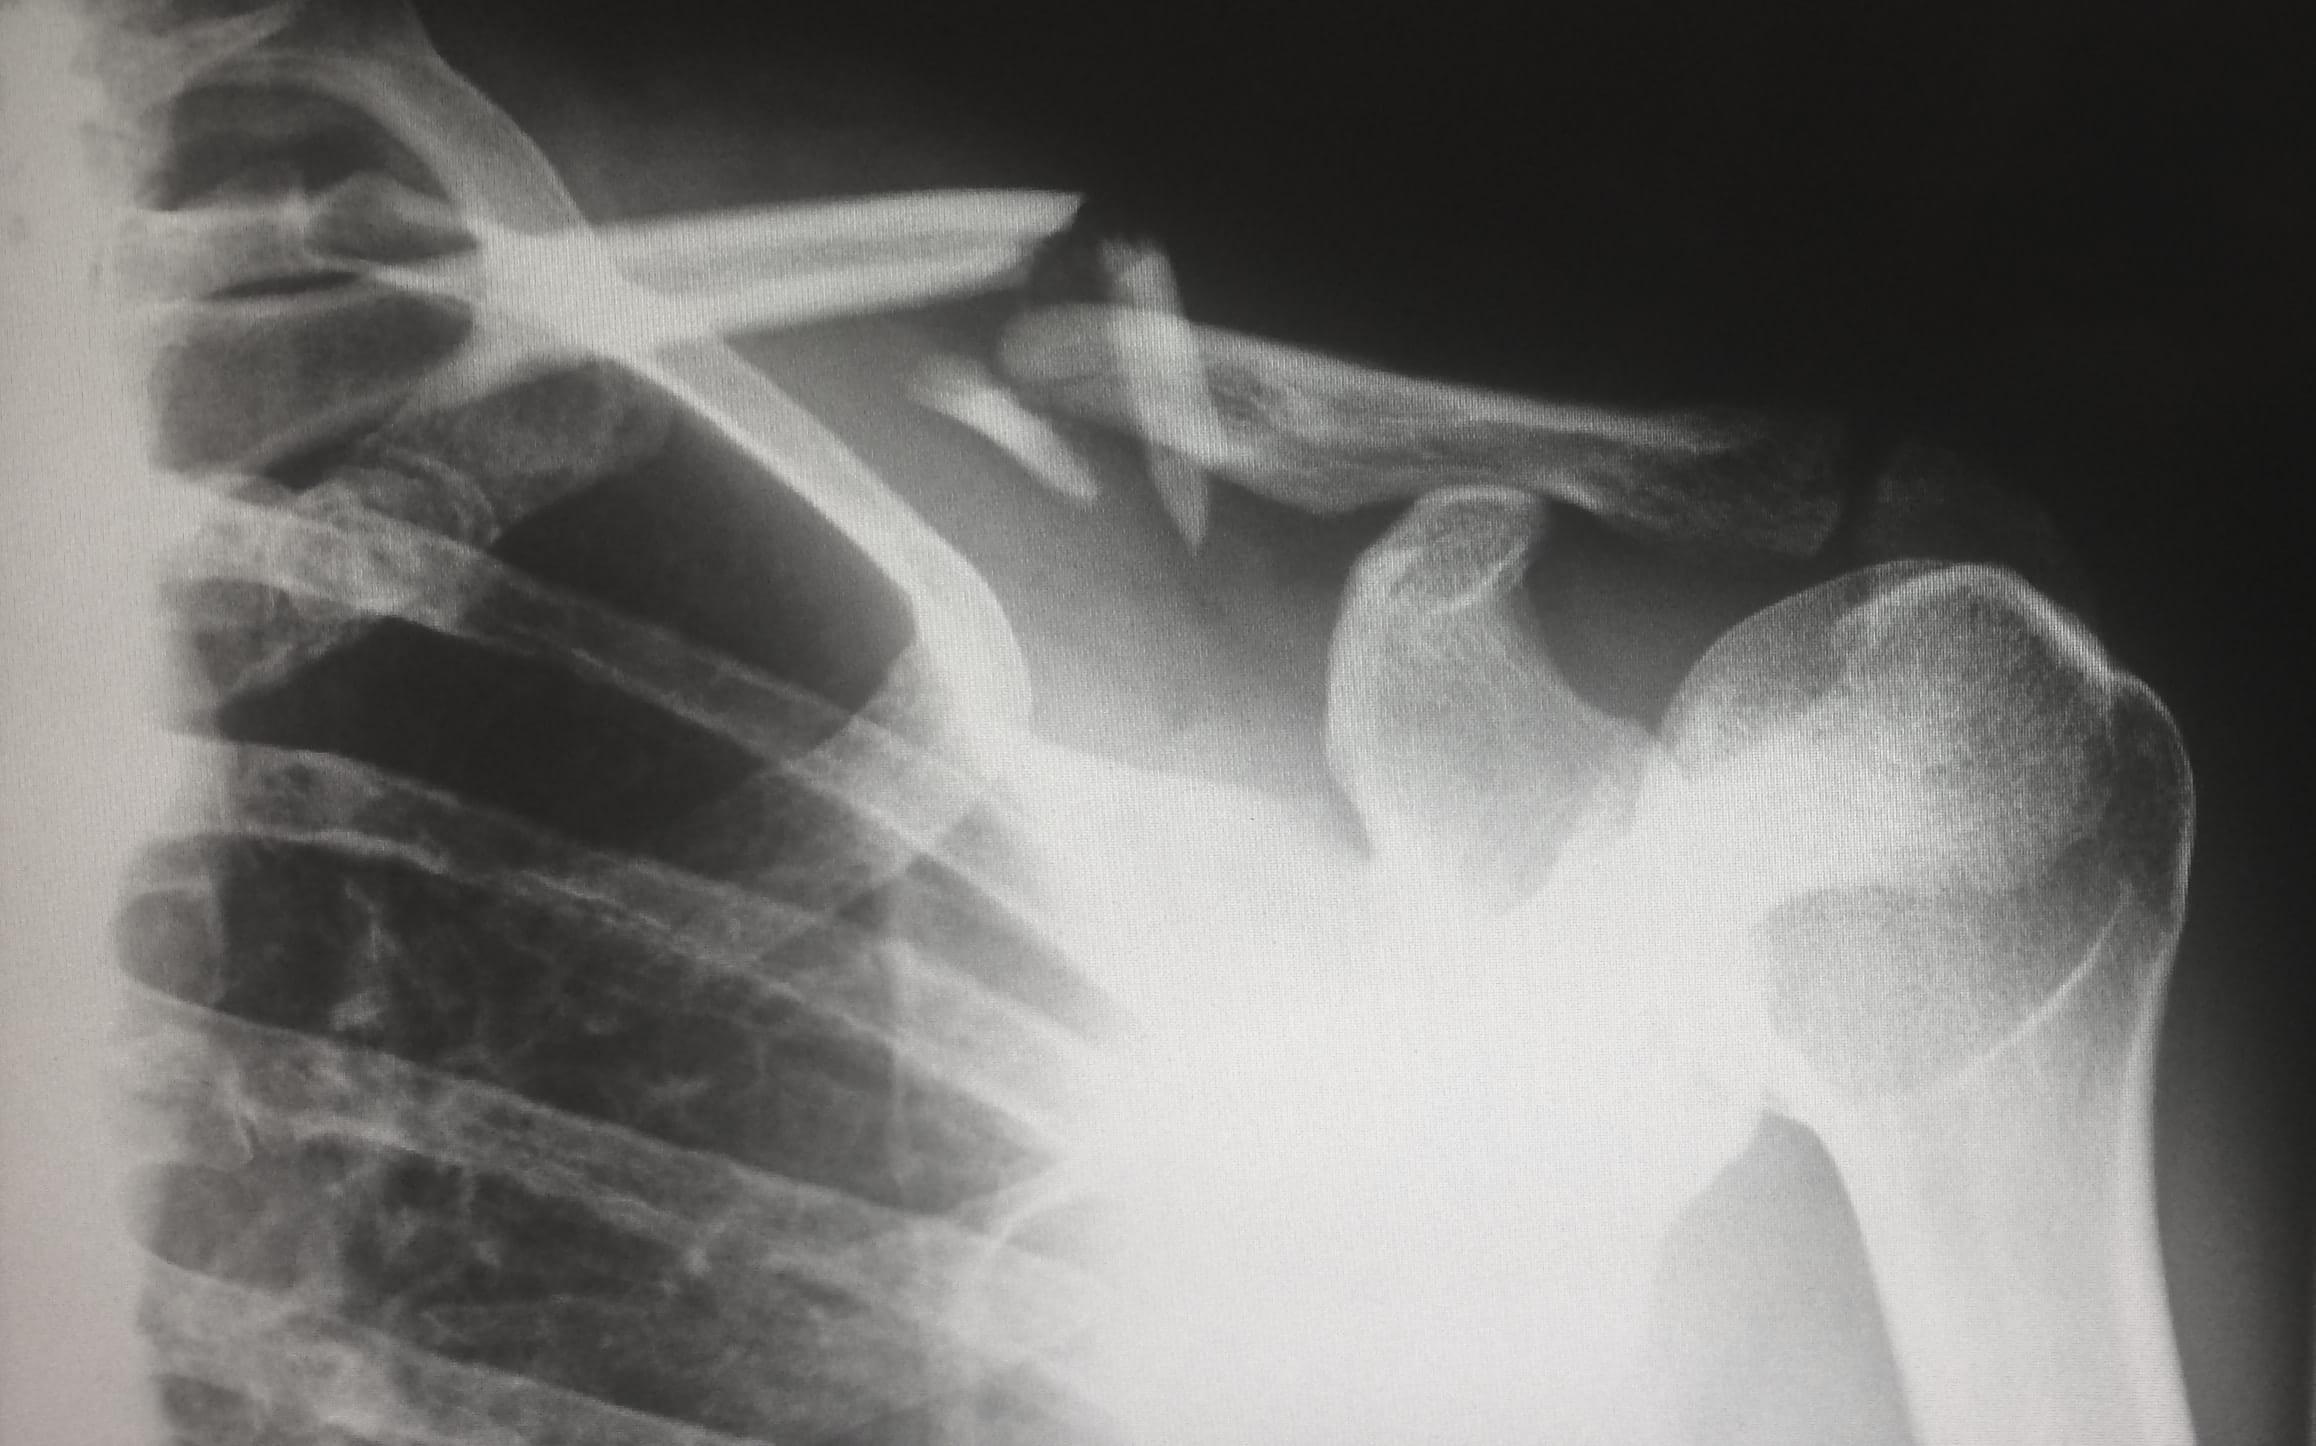 X-ray of broken collar bone; image by Harlie Raethel, via Unsplash.com.